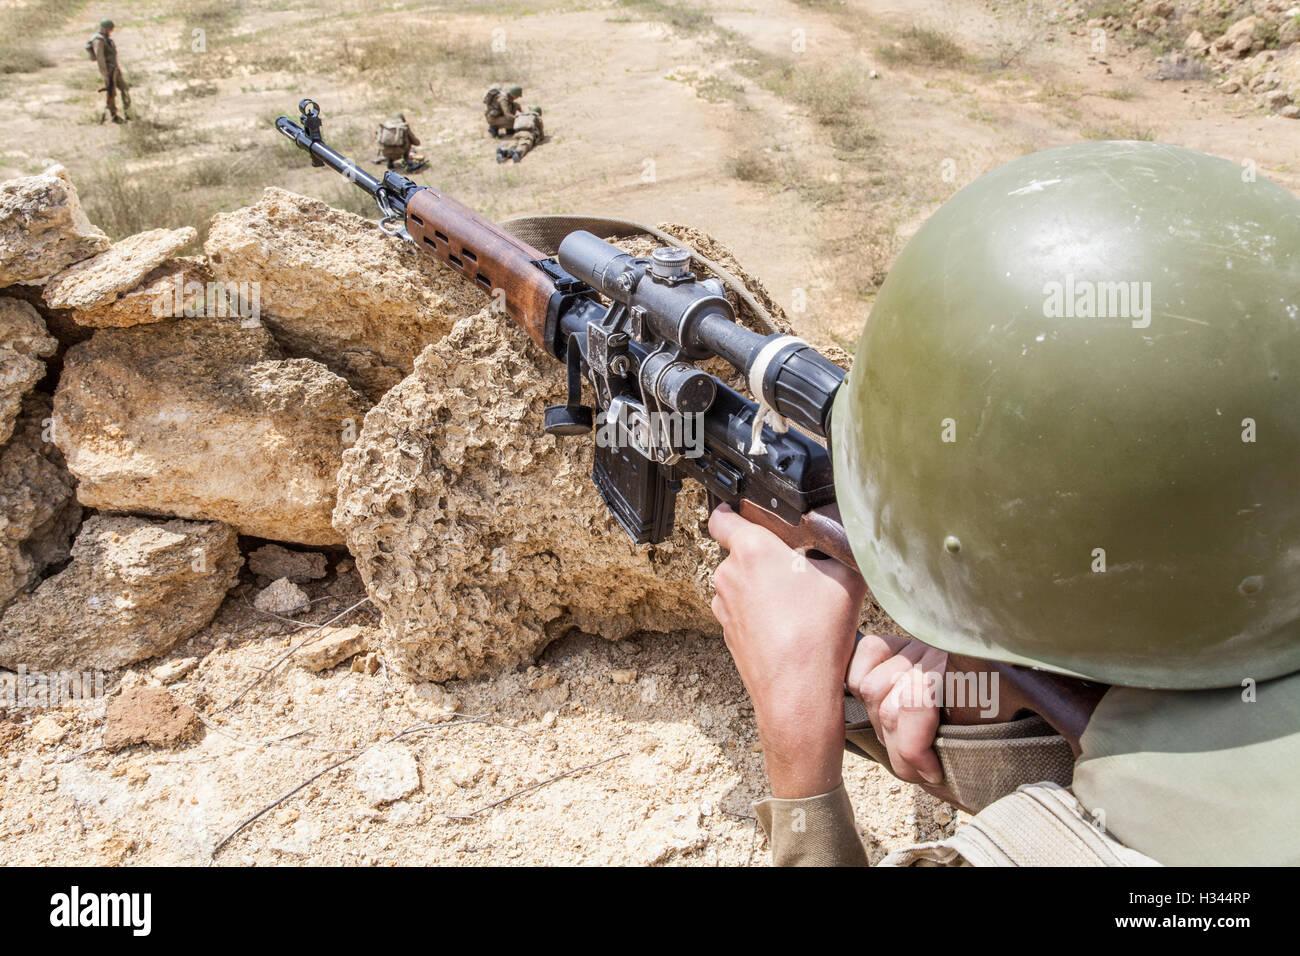 Soviet Afghanistan war - Page 6 Soviet-paratrooper-in-afghanistan-H344RP